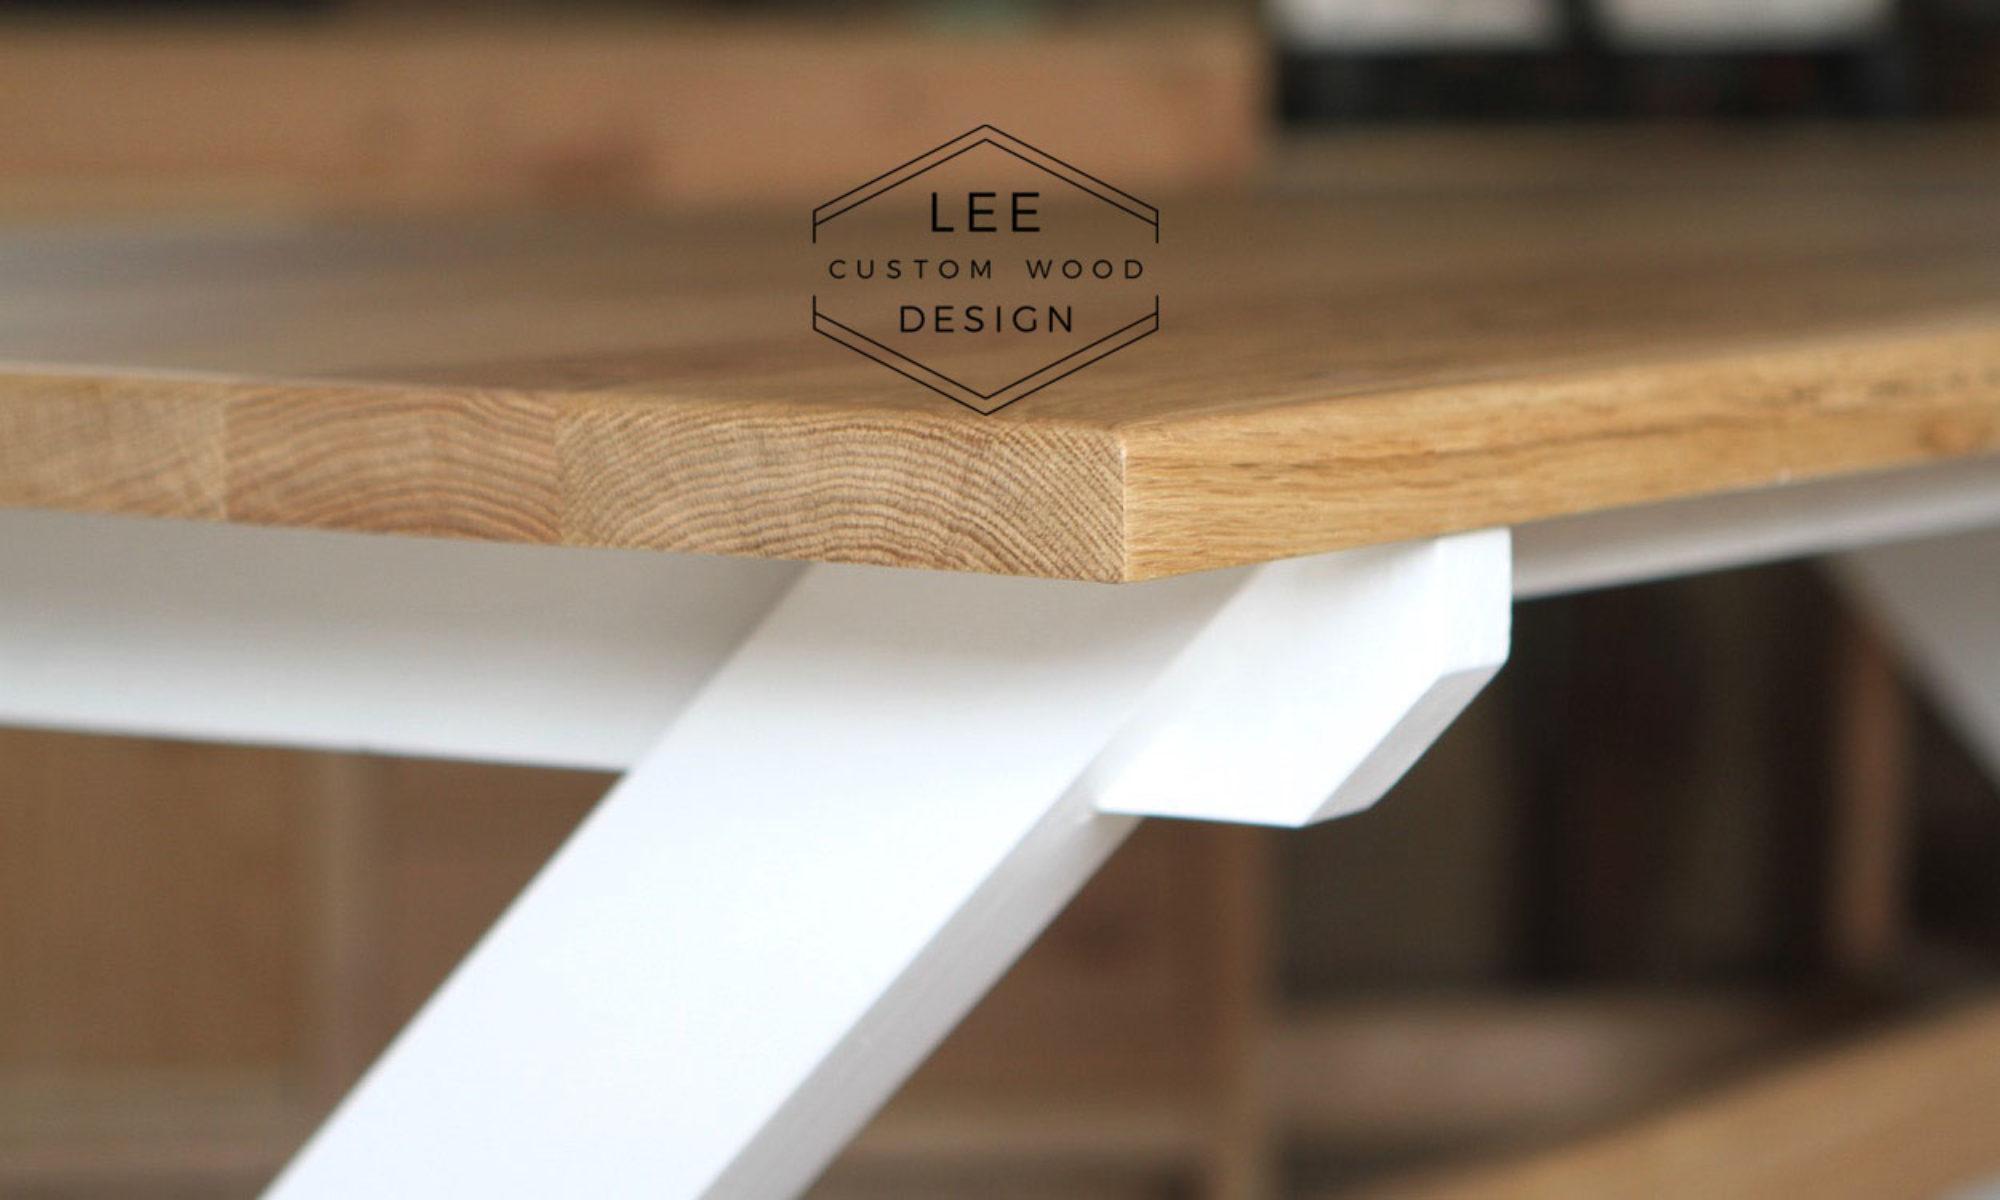 Lee Custom Wood Design